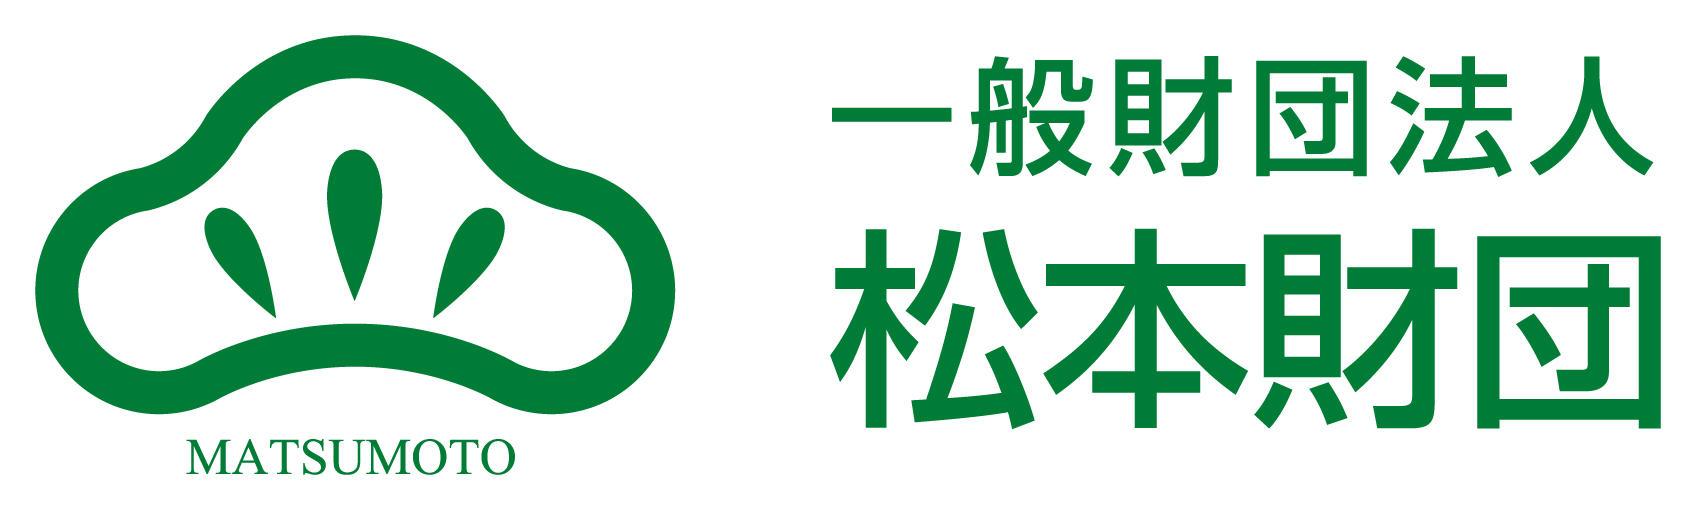 Matsumoto general incorporated foundation